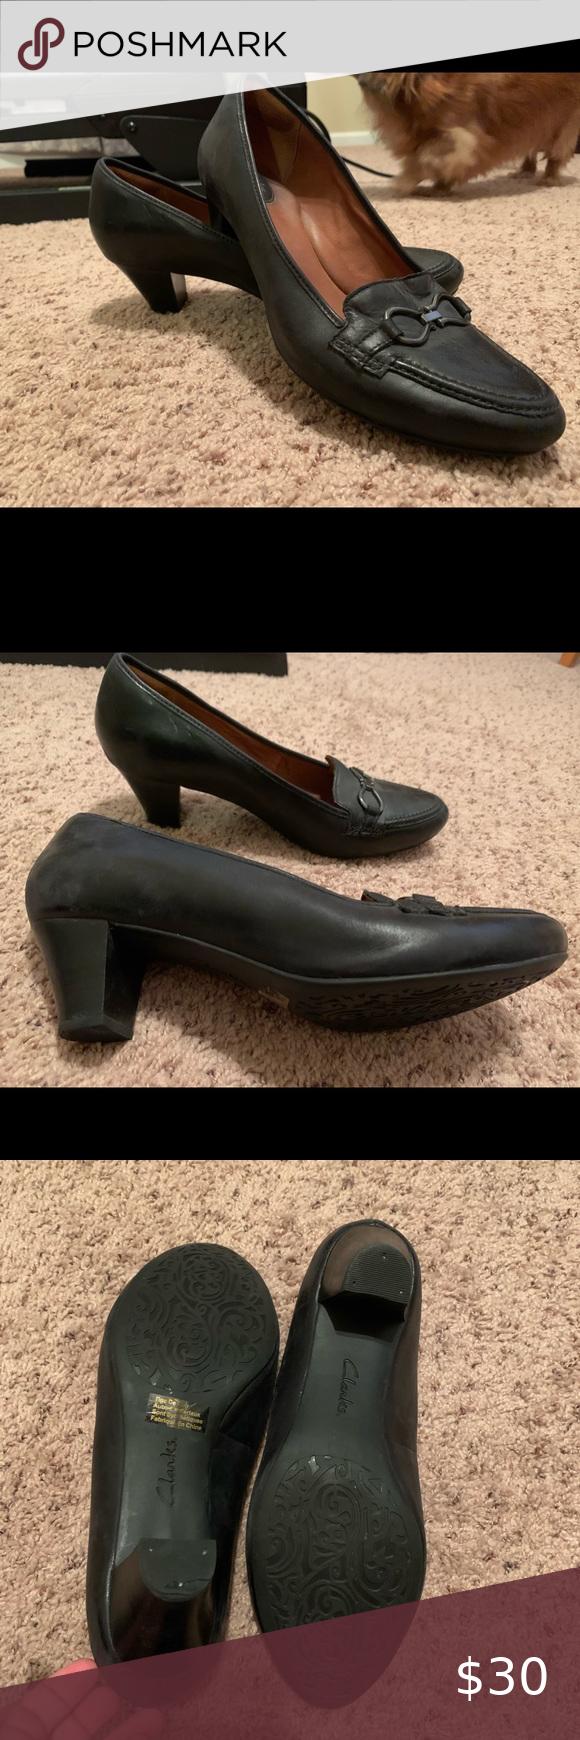 Used Clarks Artisan Decade Capri Pump Used Very Comfortable Black Dress Shoe Has A Small Hee Shoes Women Heels Comfortable Black Dress Shoes Black Dress Shoe [ 1740 x 580 Pixel ]